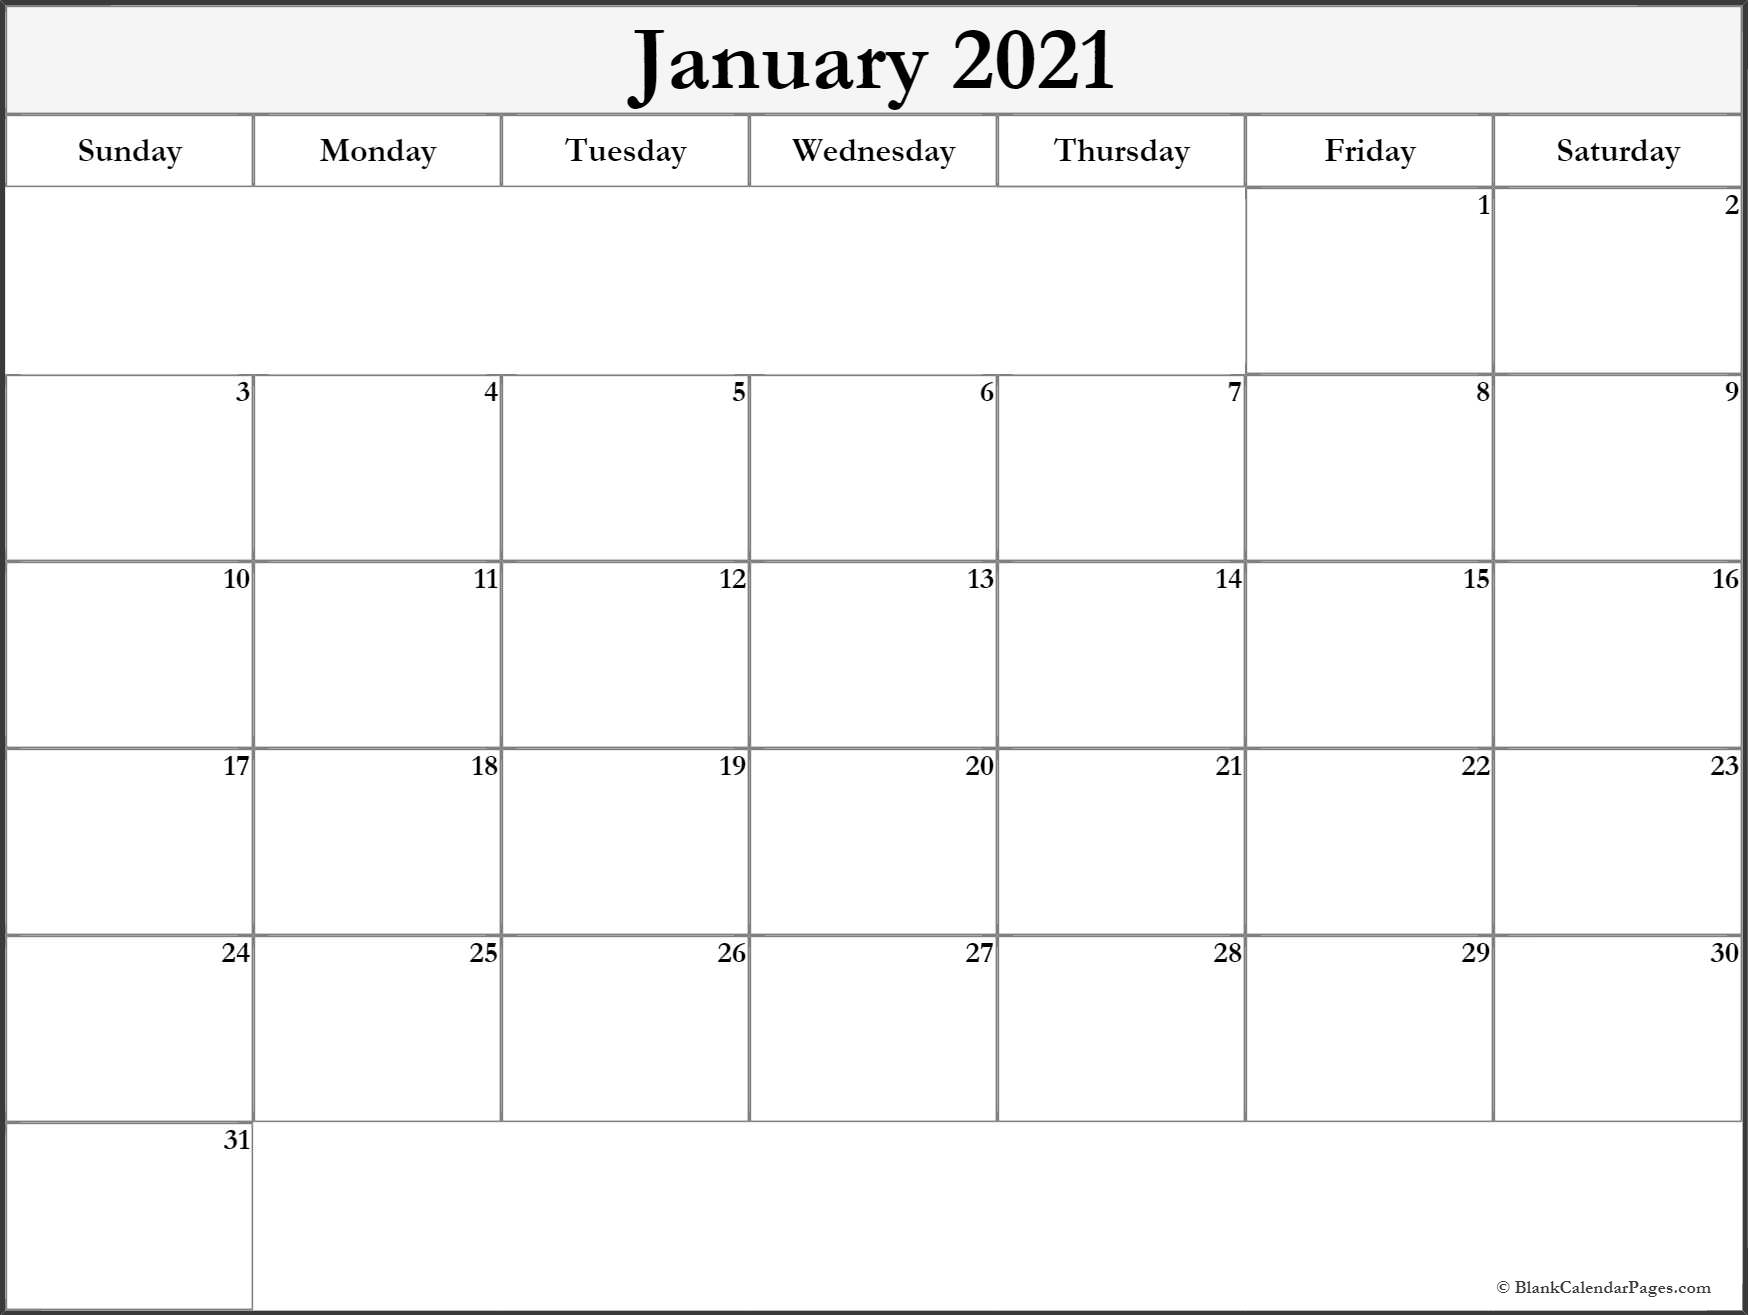 January 2021 Blank Calendar Collection 10